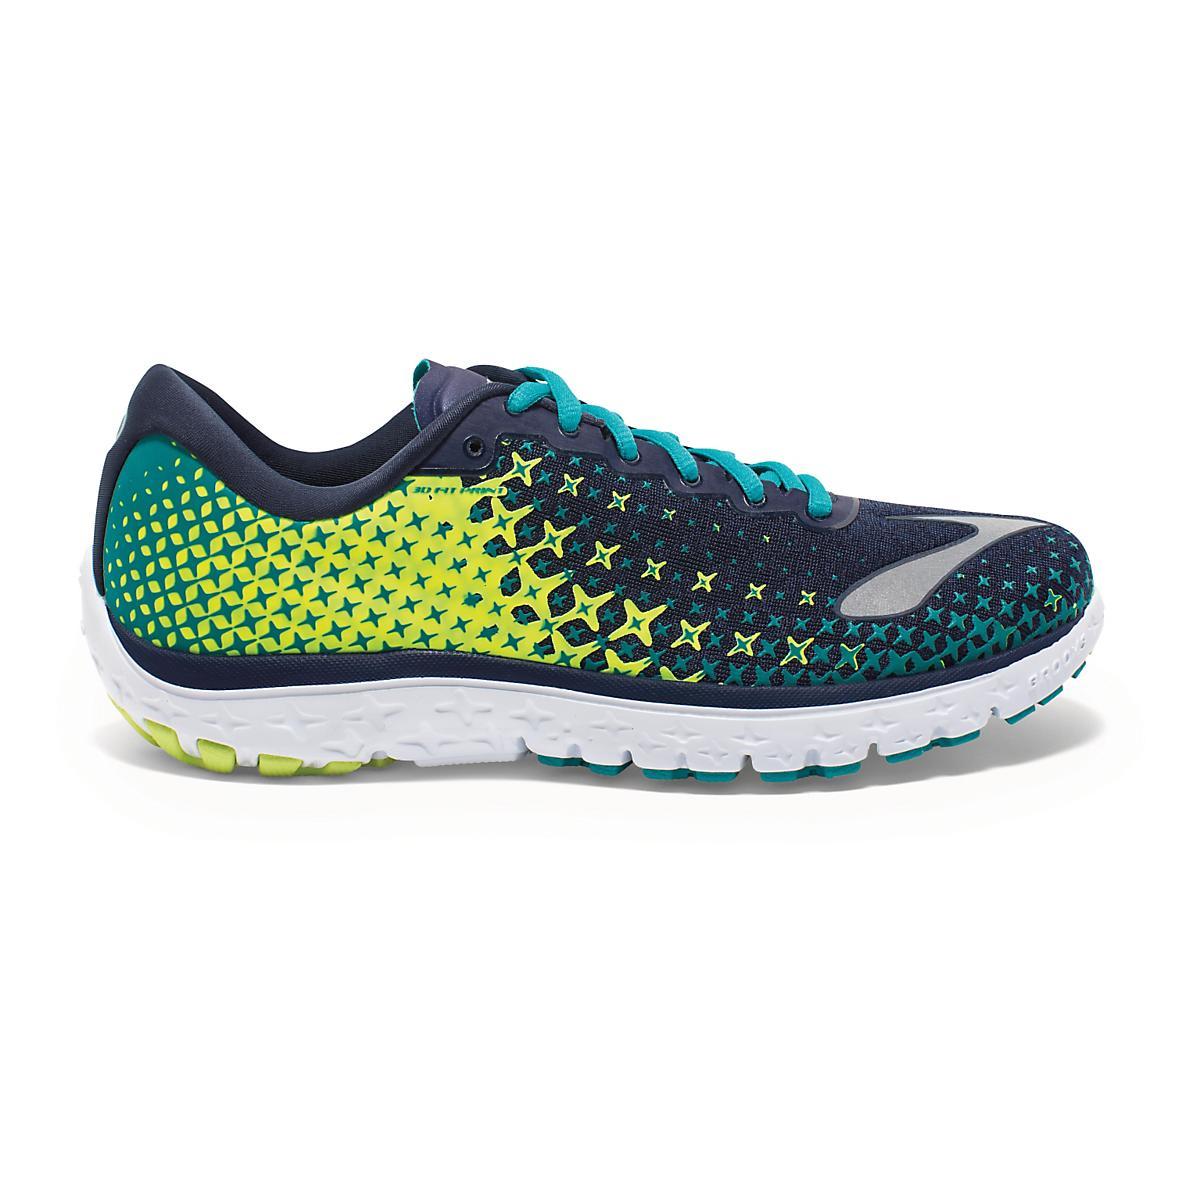 d7c32bd4361 Womens Brooks PureFlow 5 Running Shoe at Road Runner Sports